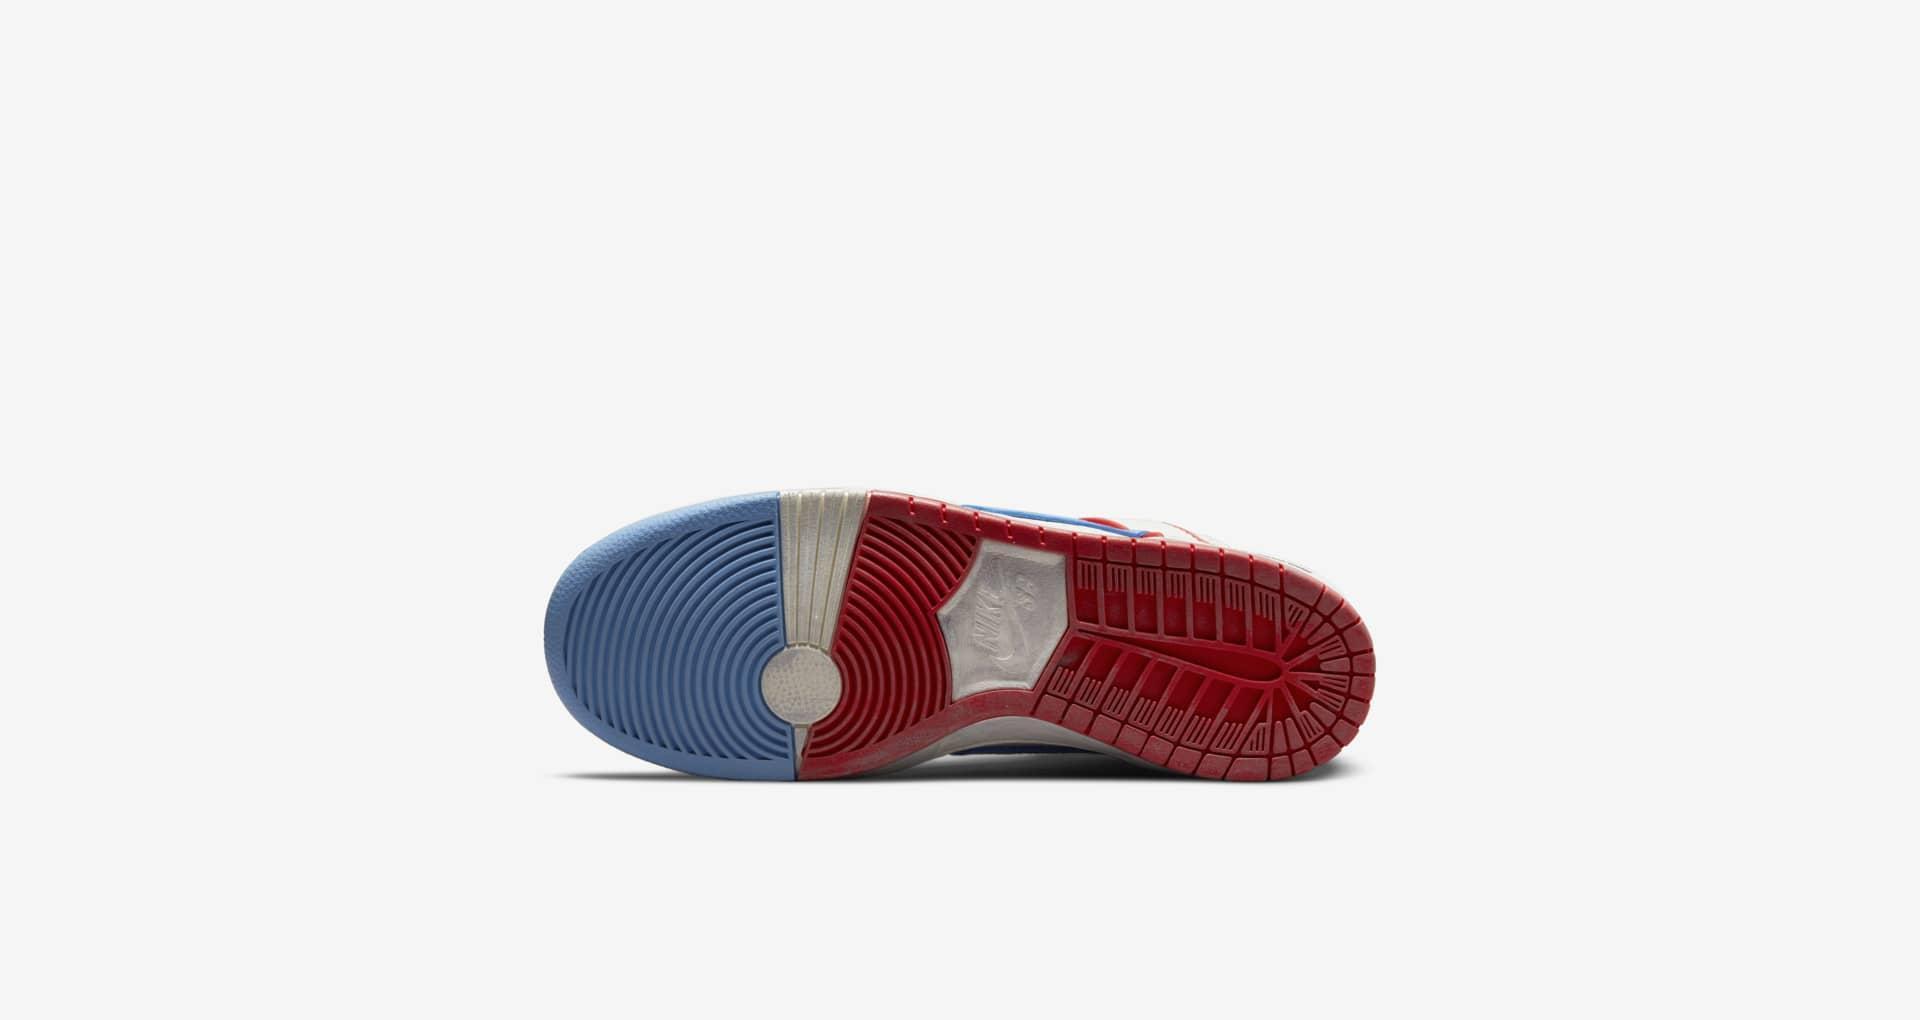 Magnus Walker-schoenen (Nike x Ishod Wair)